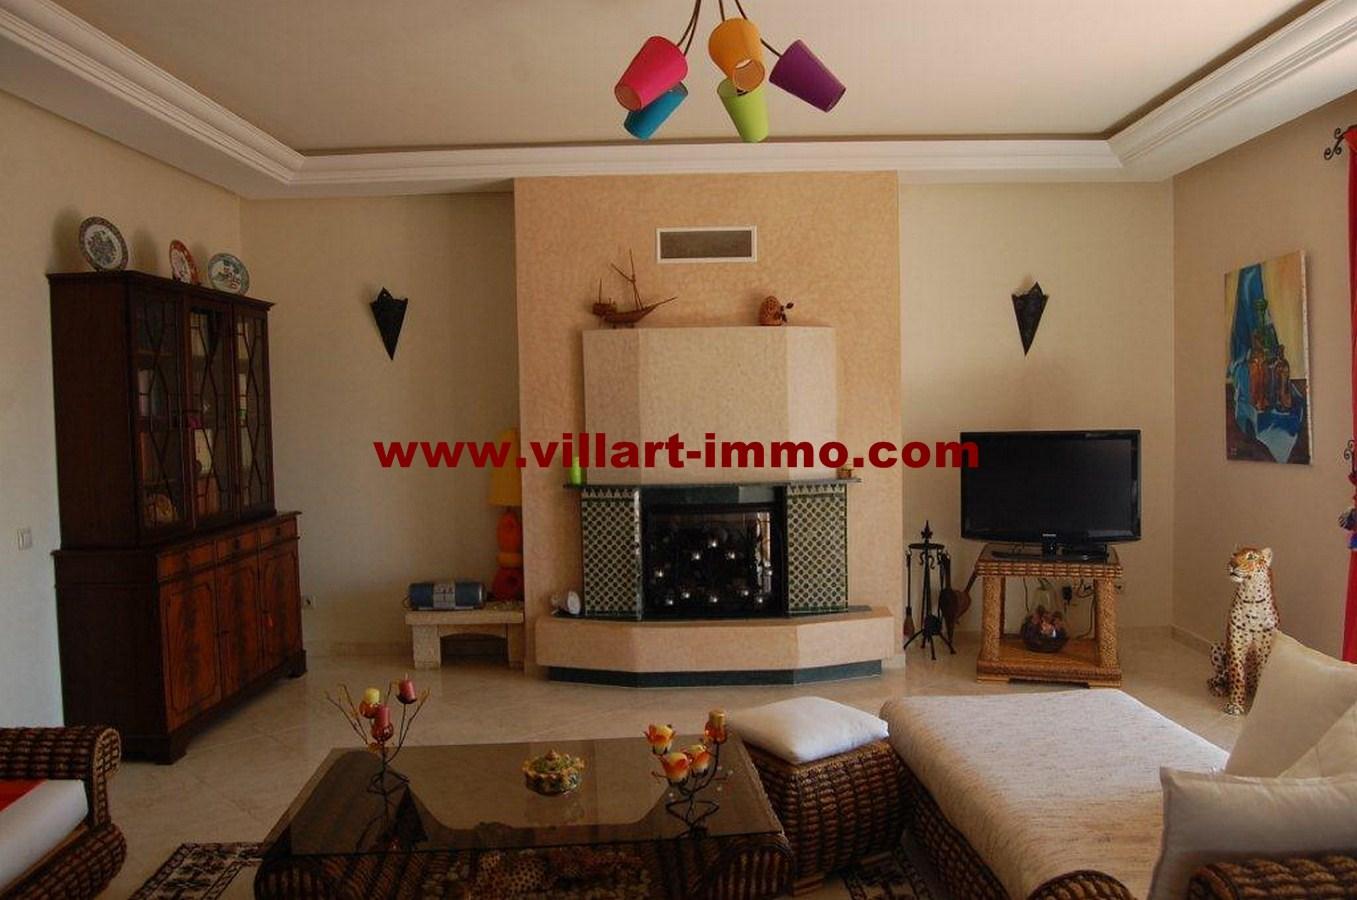 2-vente-appartement-tanger-la-montagne-salon-2-va452-villart-immo